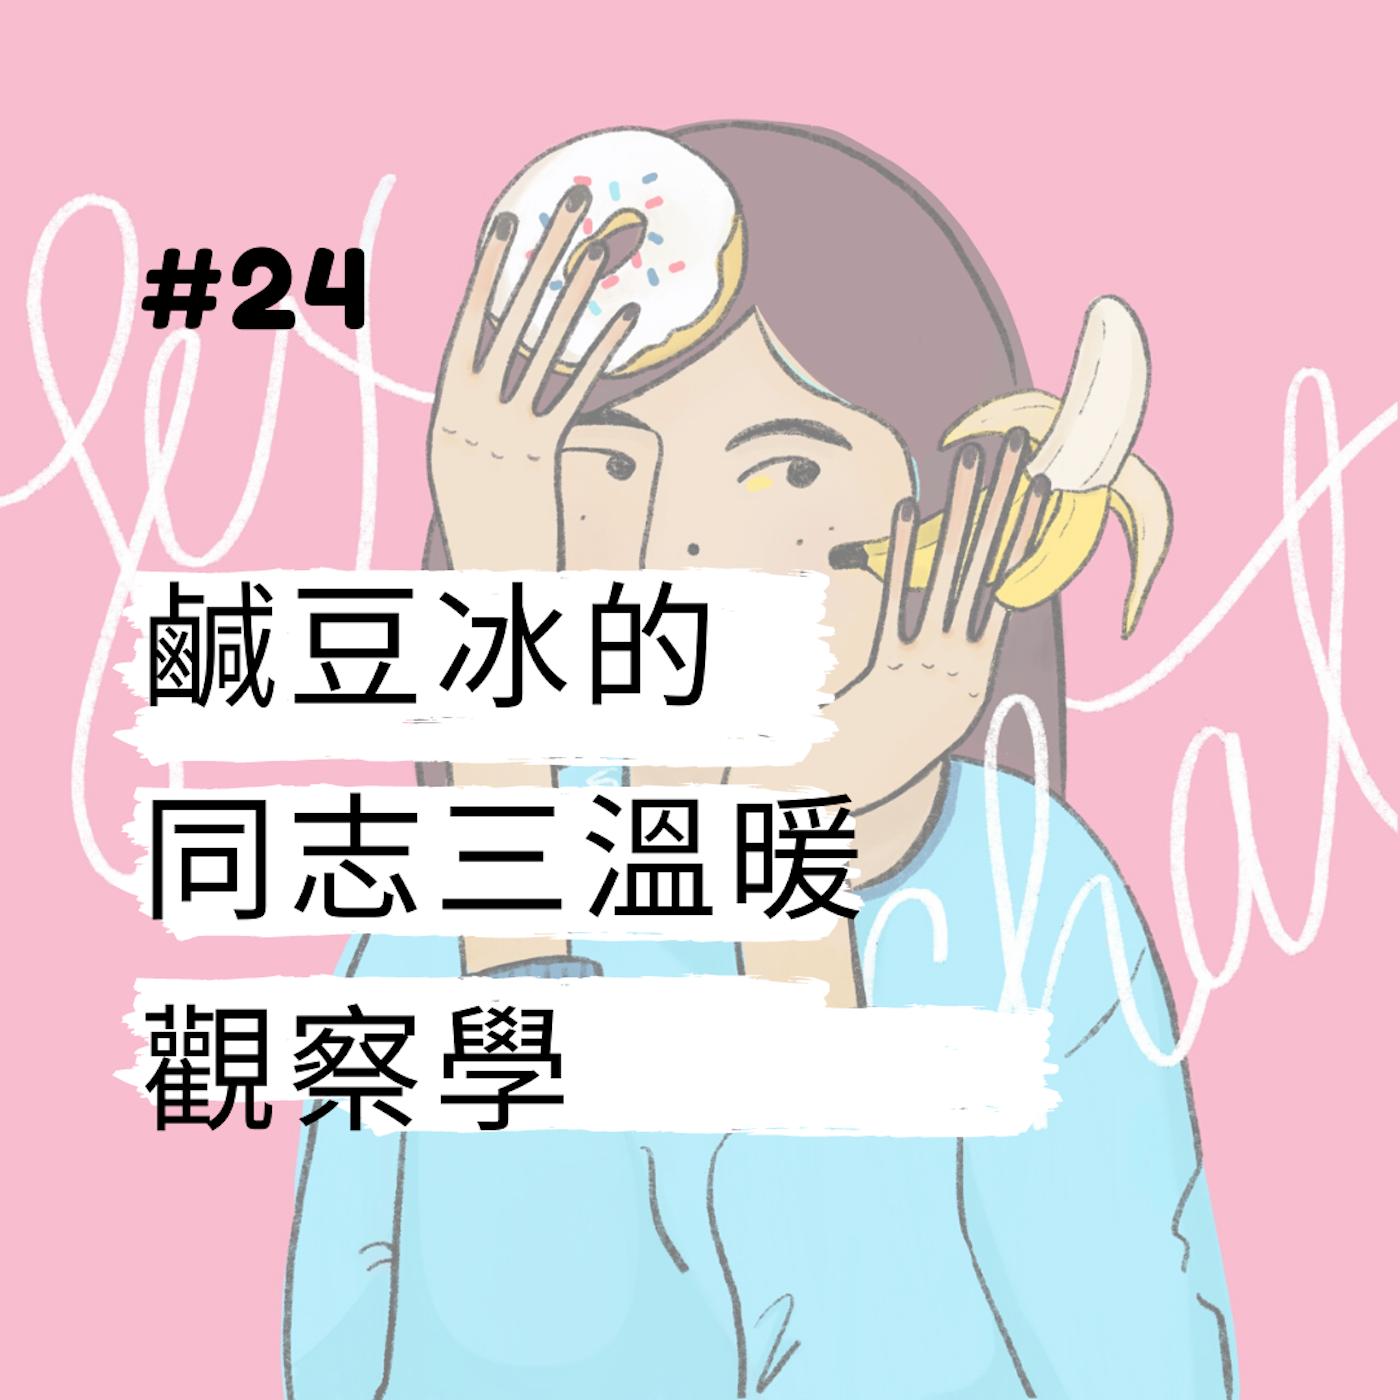 Sex Chat podcast #24 鹹豆冰的同志三溫暖觀察學